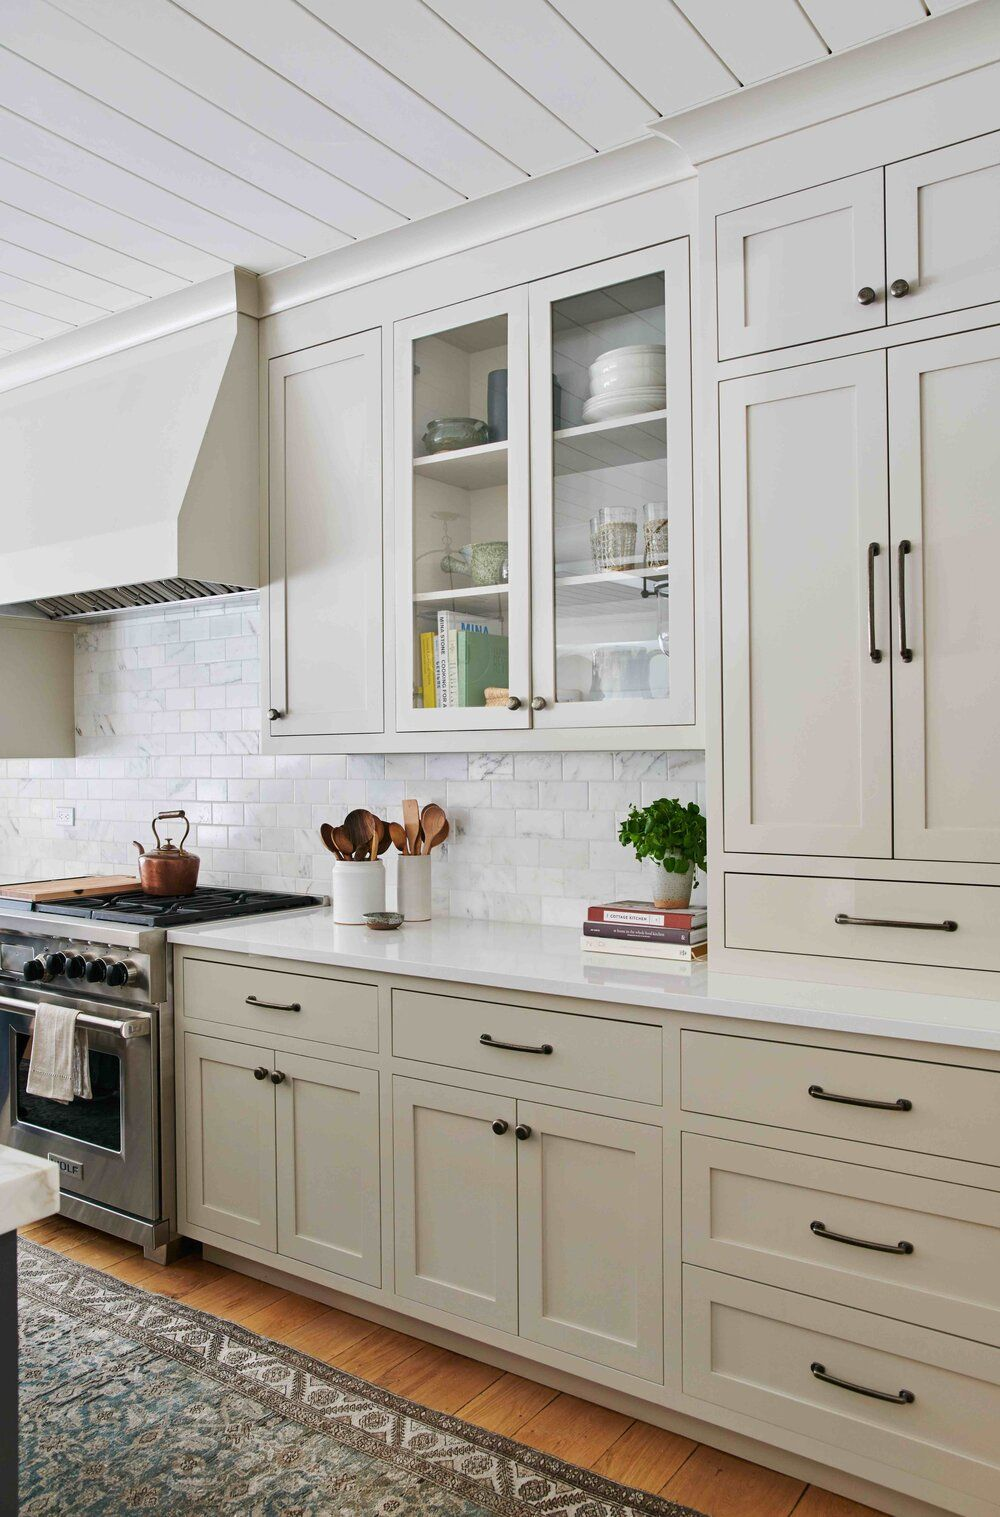 Designers Amber Interiors Cabinet Color Revere Pewter Kitchen Cabinet Design Greige Kitchen Cabinets Kitchen Cabinet Colors